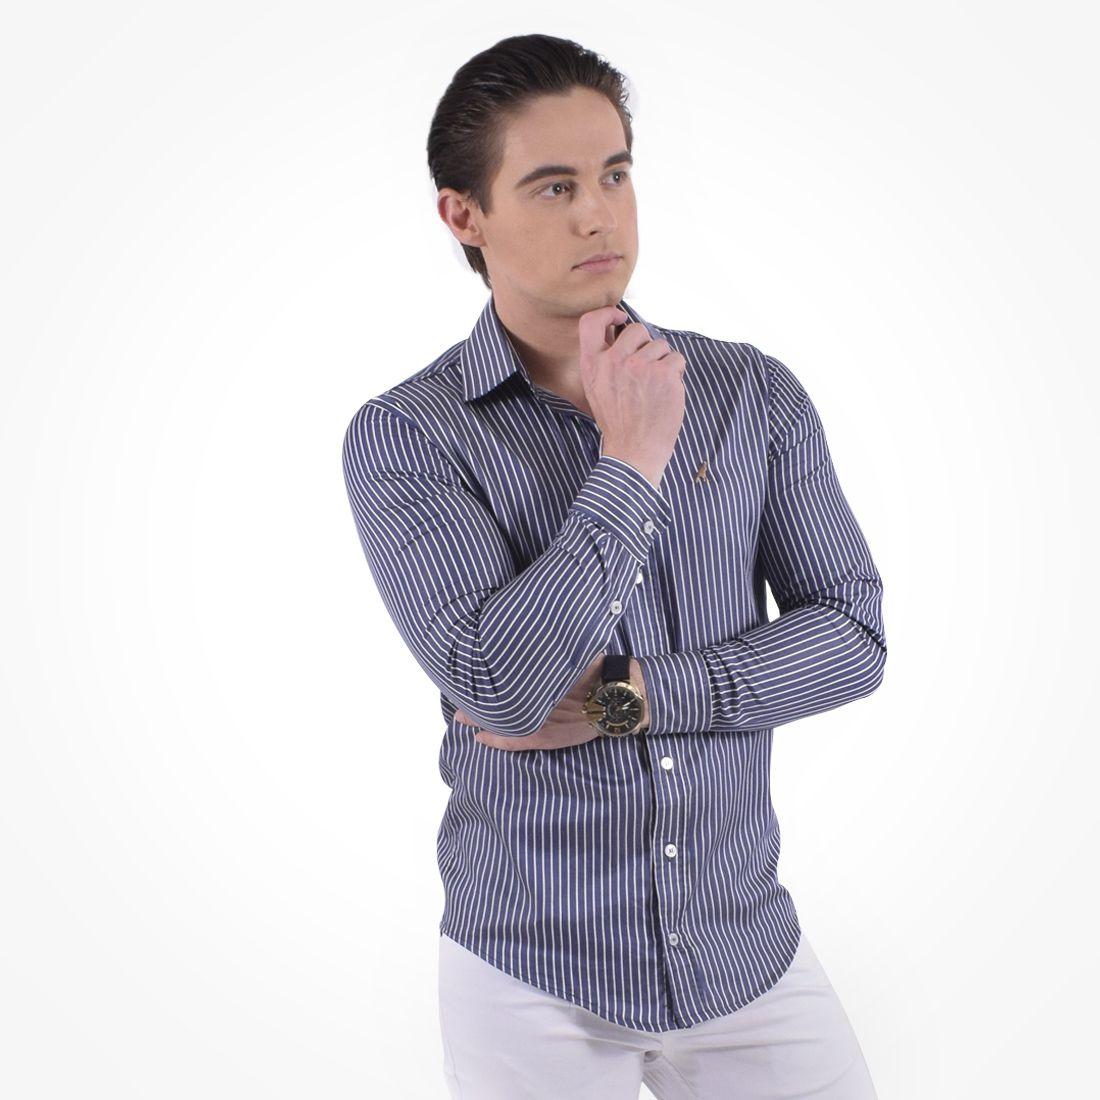 100228 - Camisa Social Listrada Masculina Slim - LEVOK